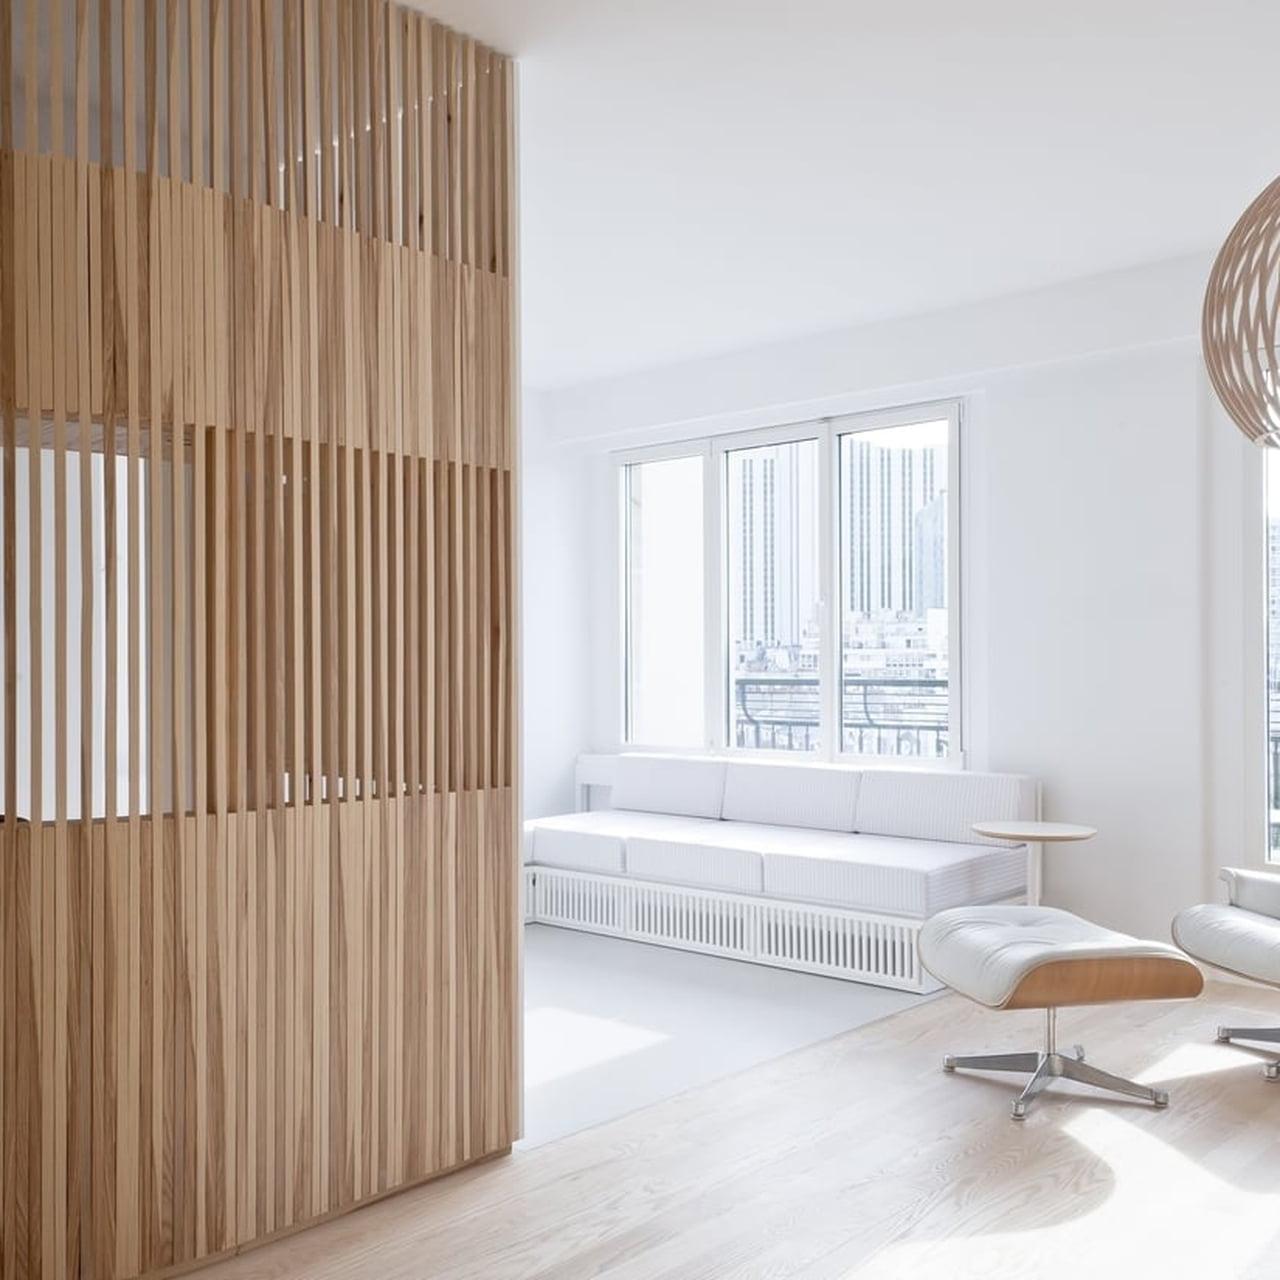 claustra decoration bois decoupe tendance minimaliste